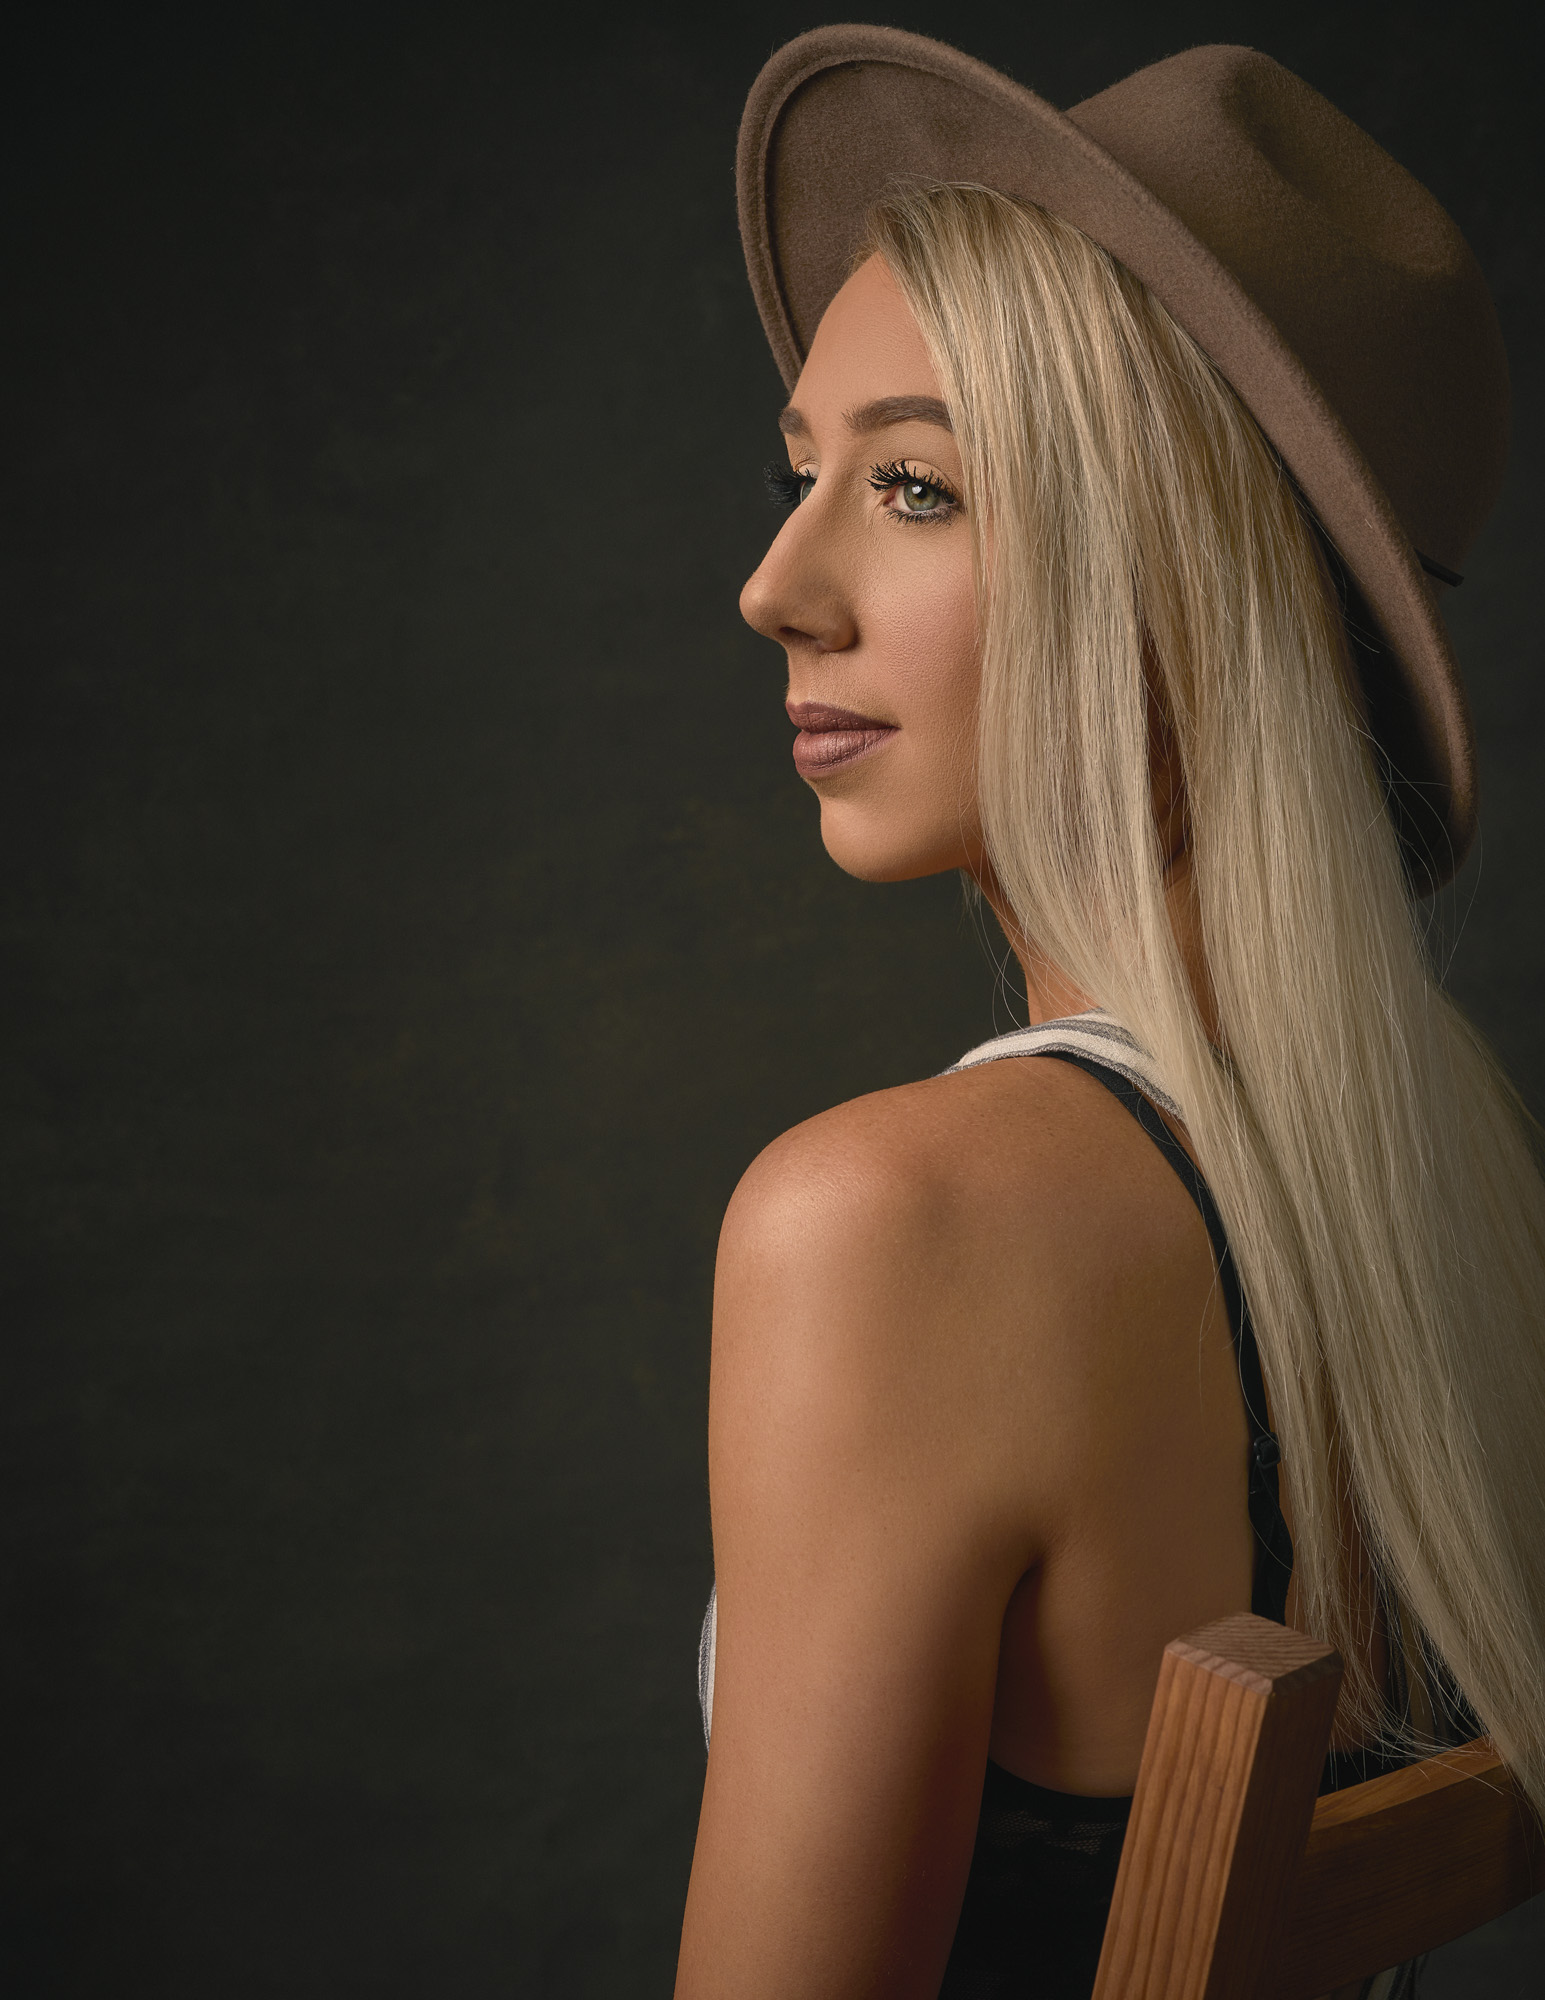 Arizona Model Ashlyn by Arizona Beauty Photographer Chad Weed